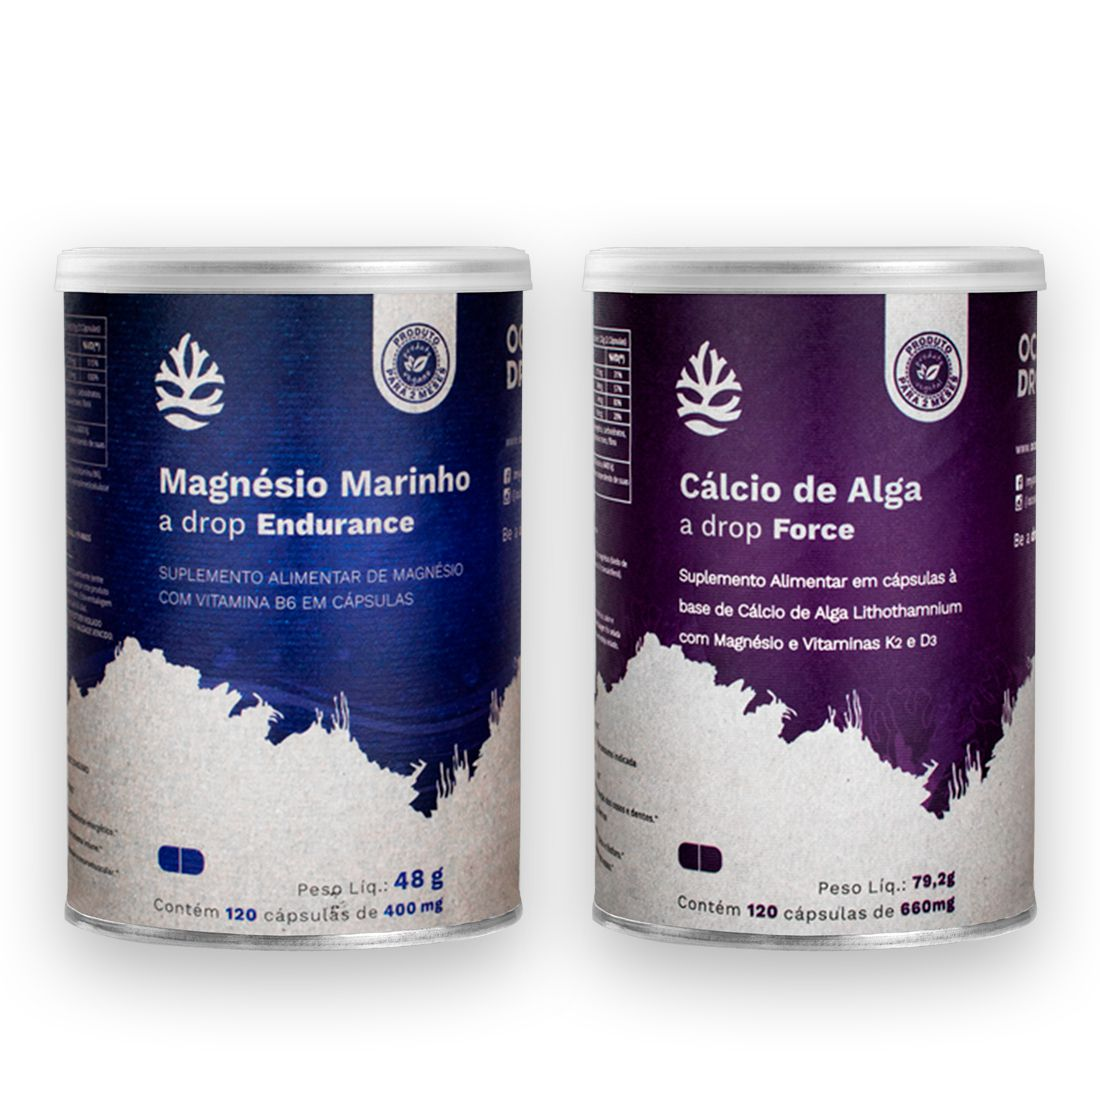 Magnésio Marinho e Cálcio de Algas 120 cáps cada - Ocean Drop